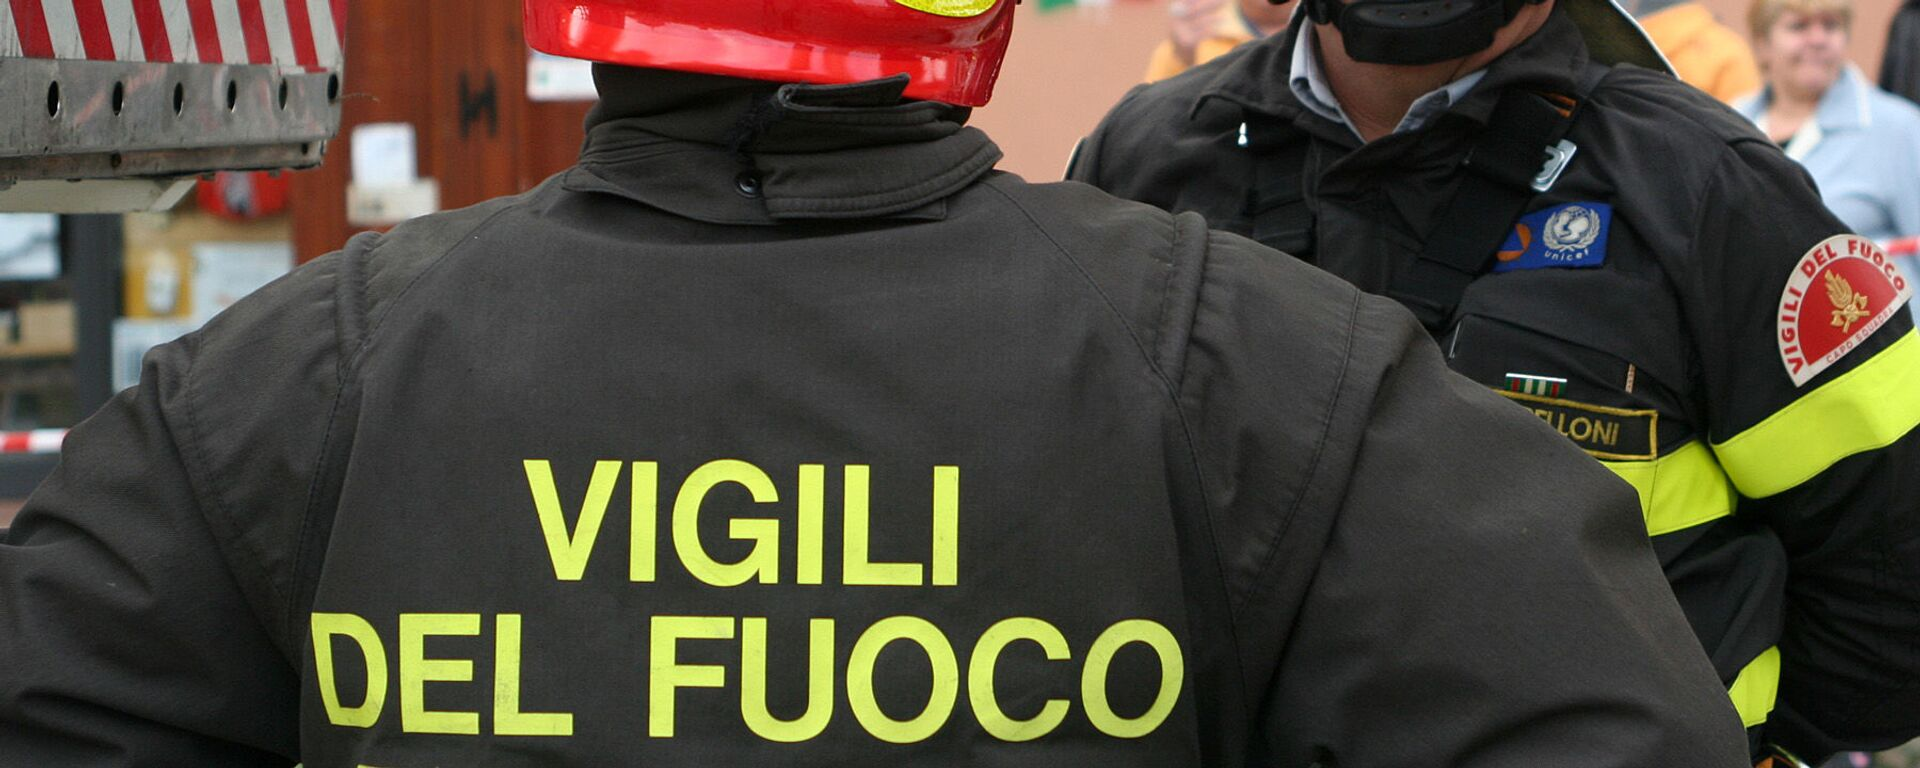 I Vigili del Fuoco italiani - Sputnik Italia, 1920, 26.12.2020